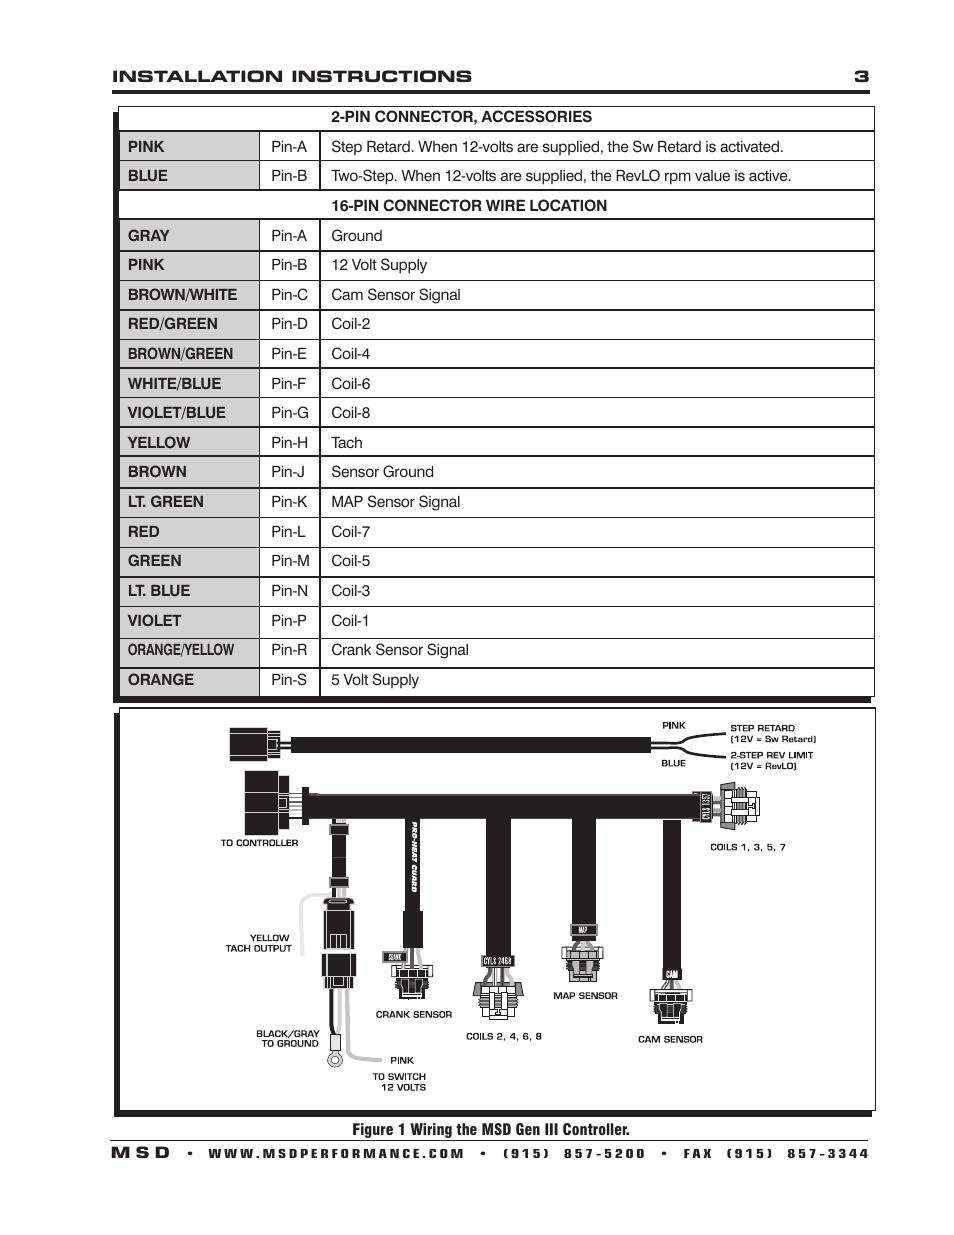 Msd 6010 Wiring Harness - Wiring Diagram Img